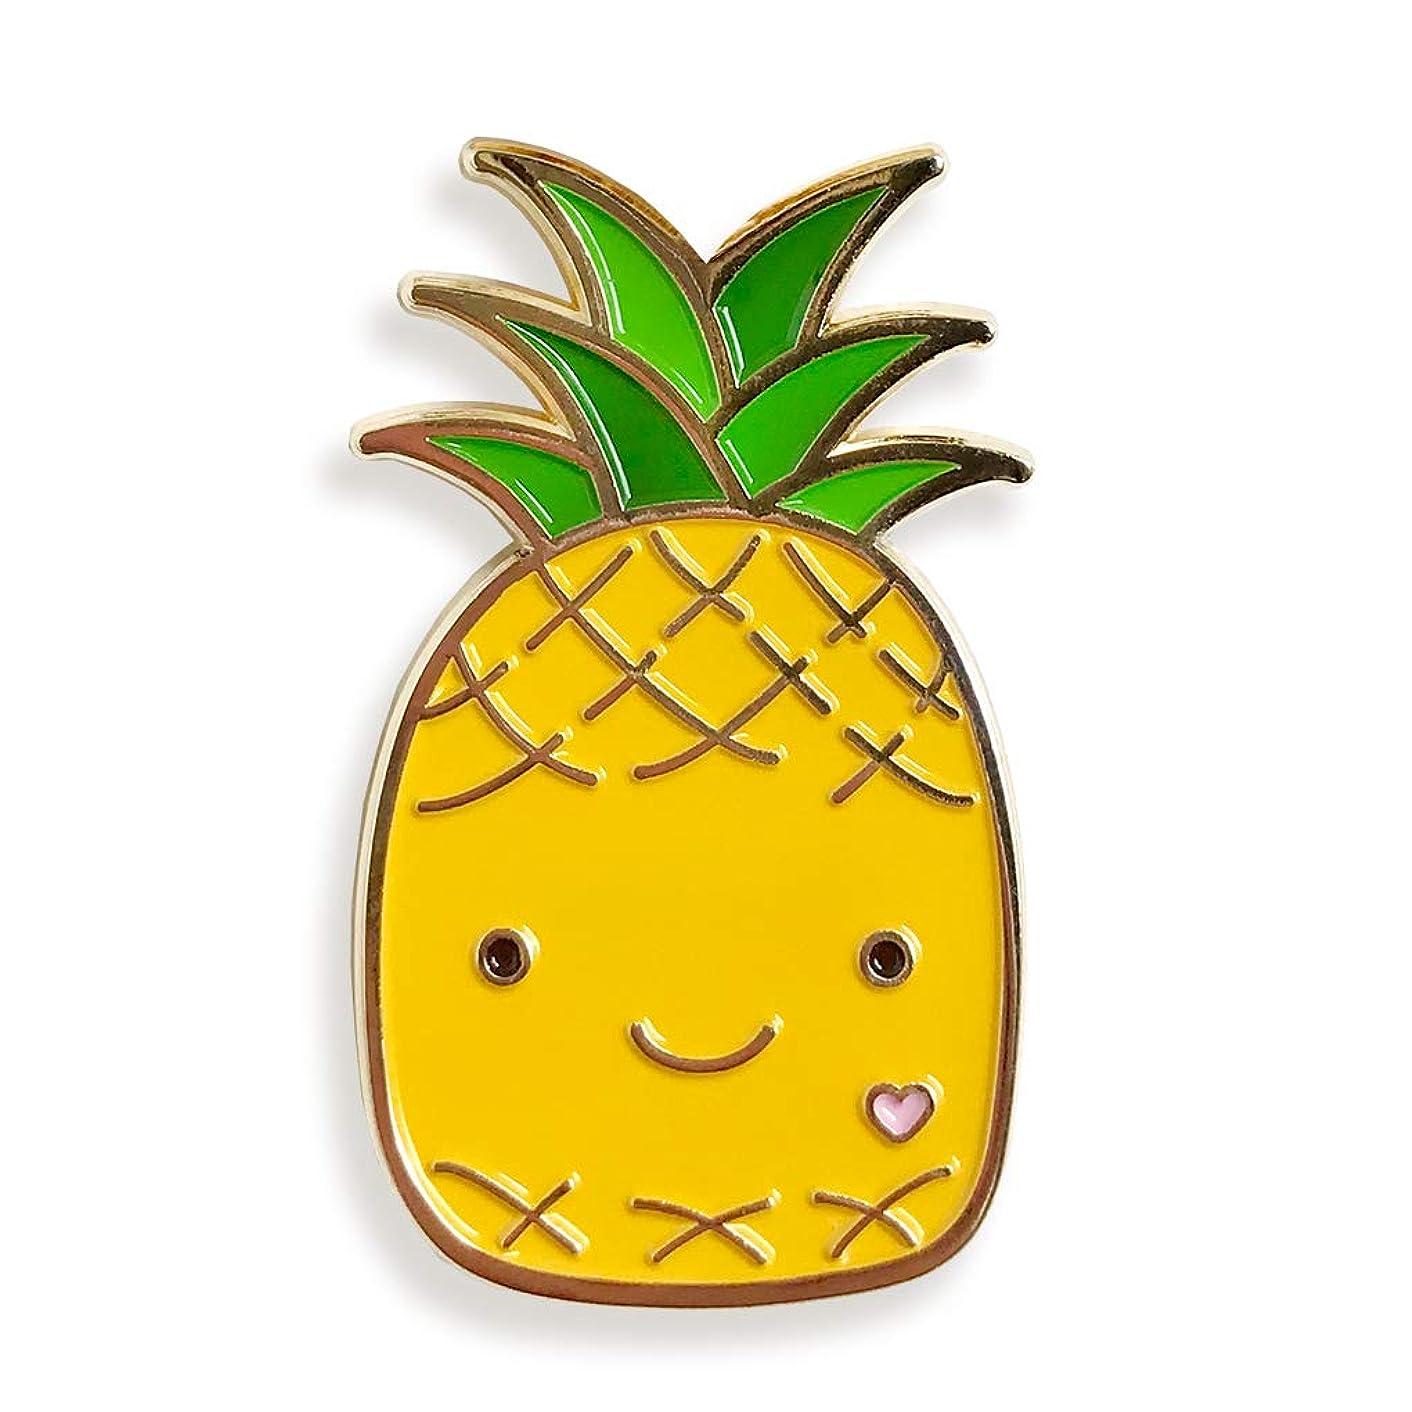 Night Owl Paper Goods Pineapple Enamel Pin Gold